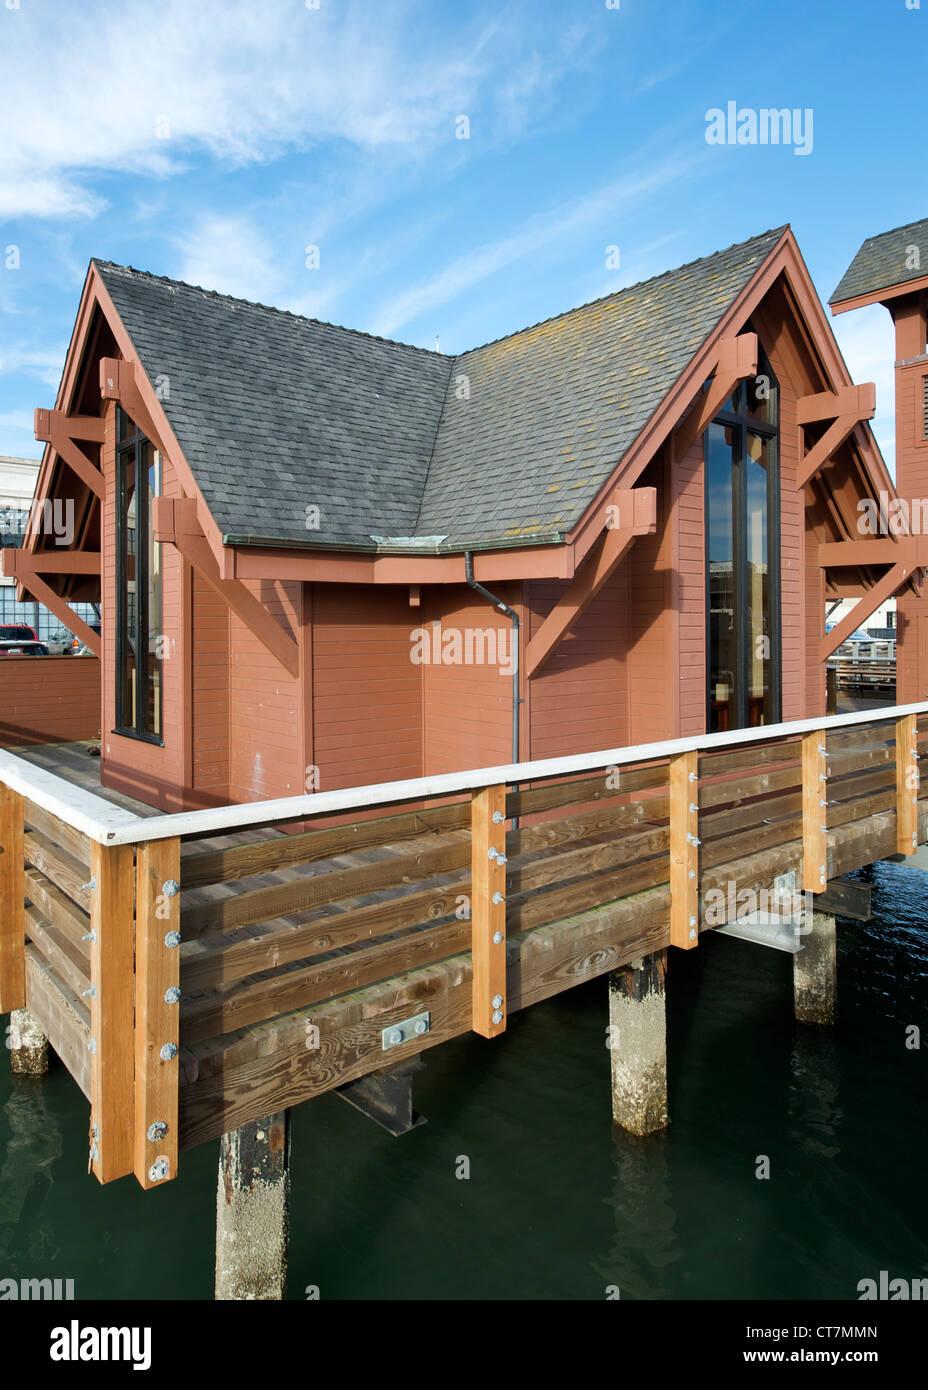 Fishermen's and Seamen's memorial chapel in Fisherman's Wharf in San Francisco, California, USA. - Stock Image